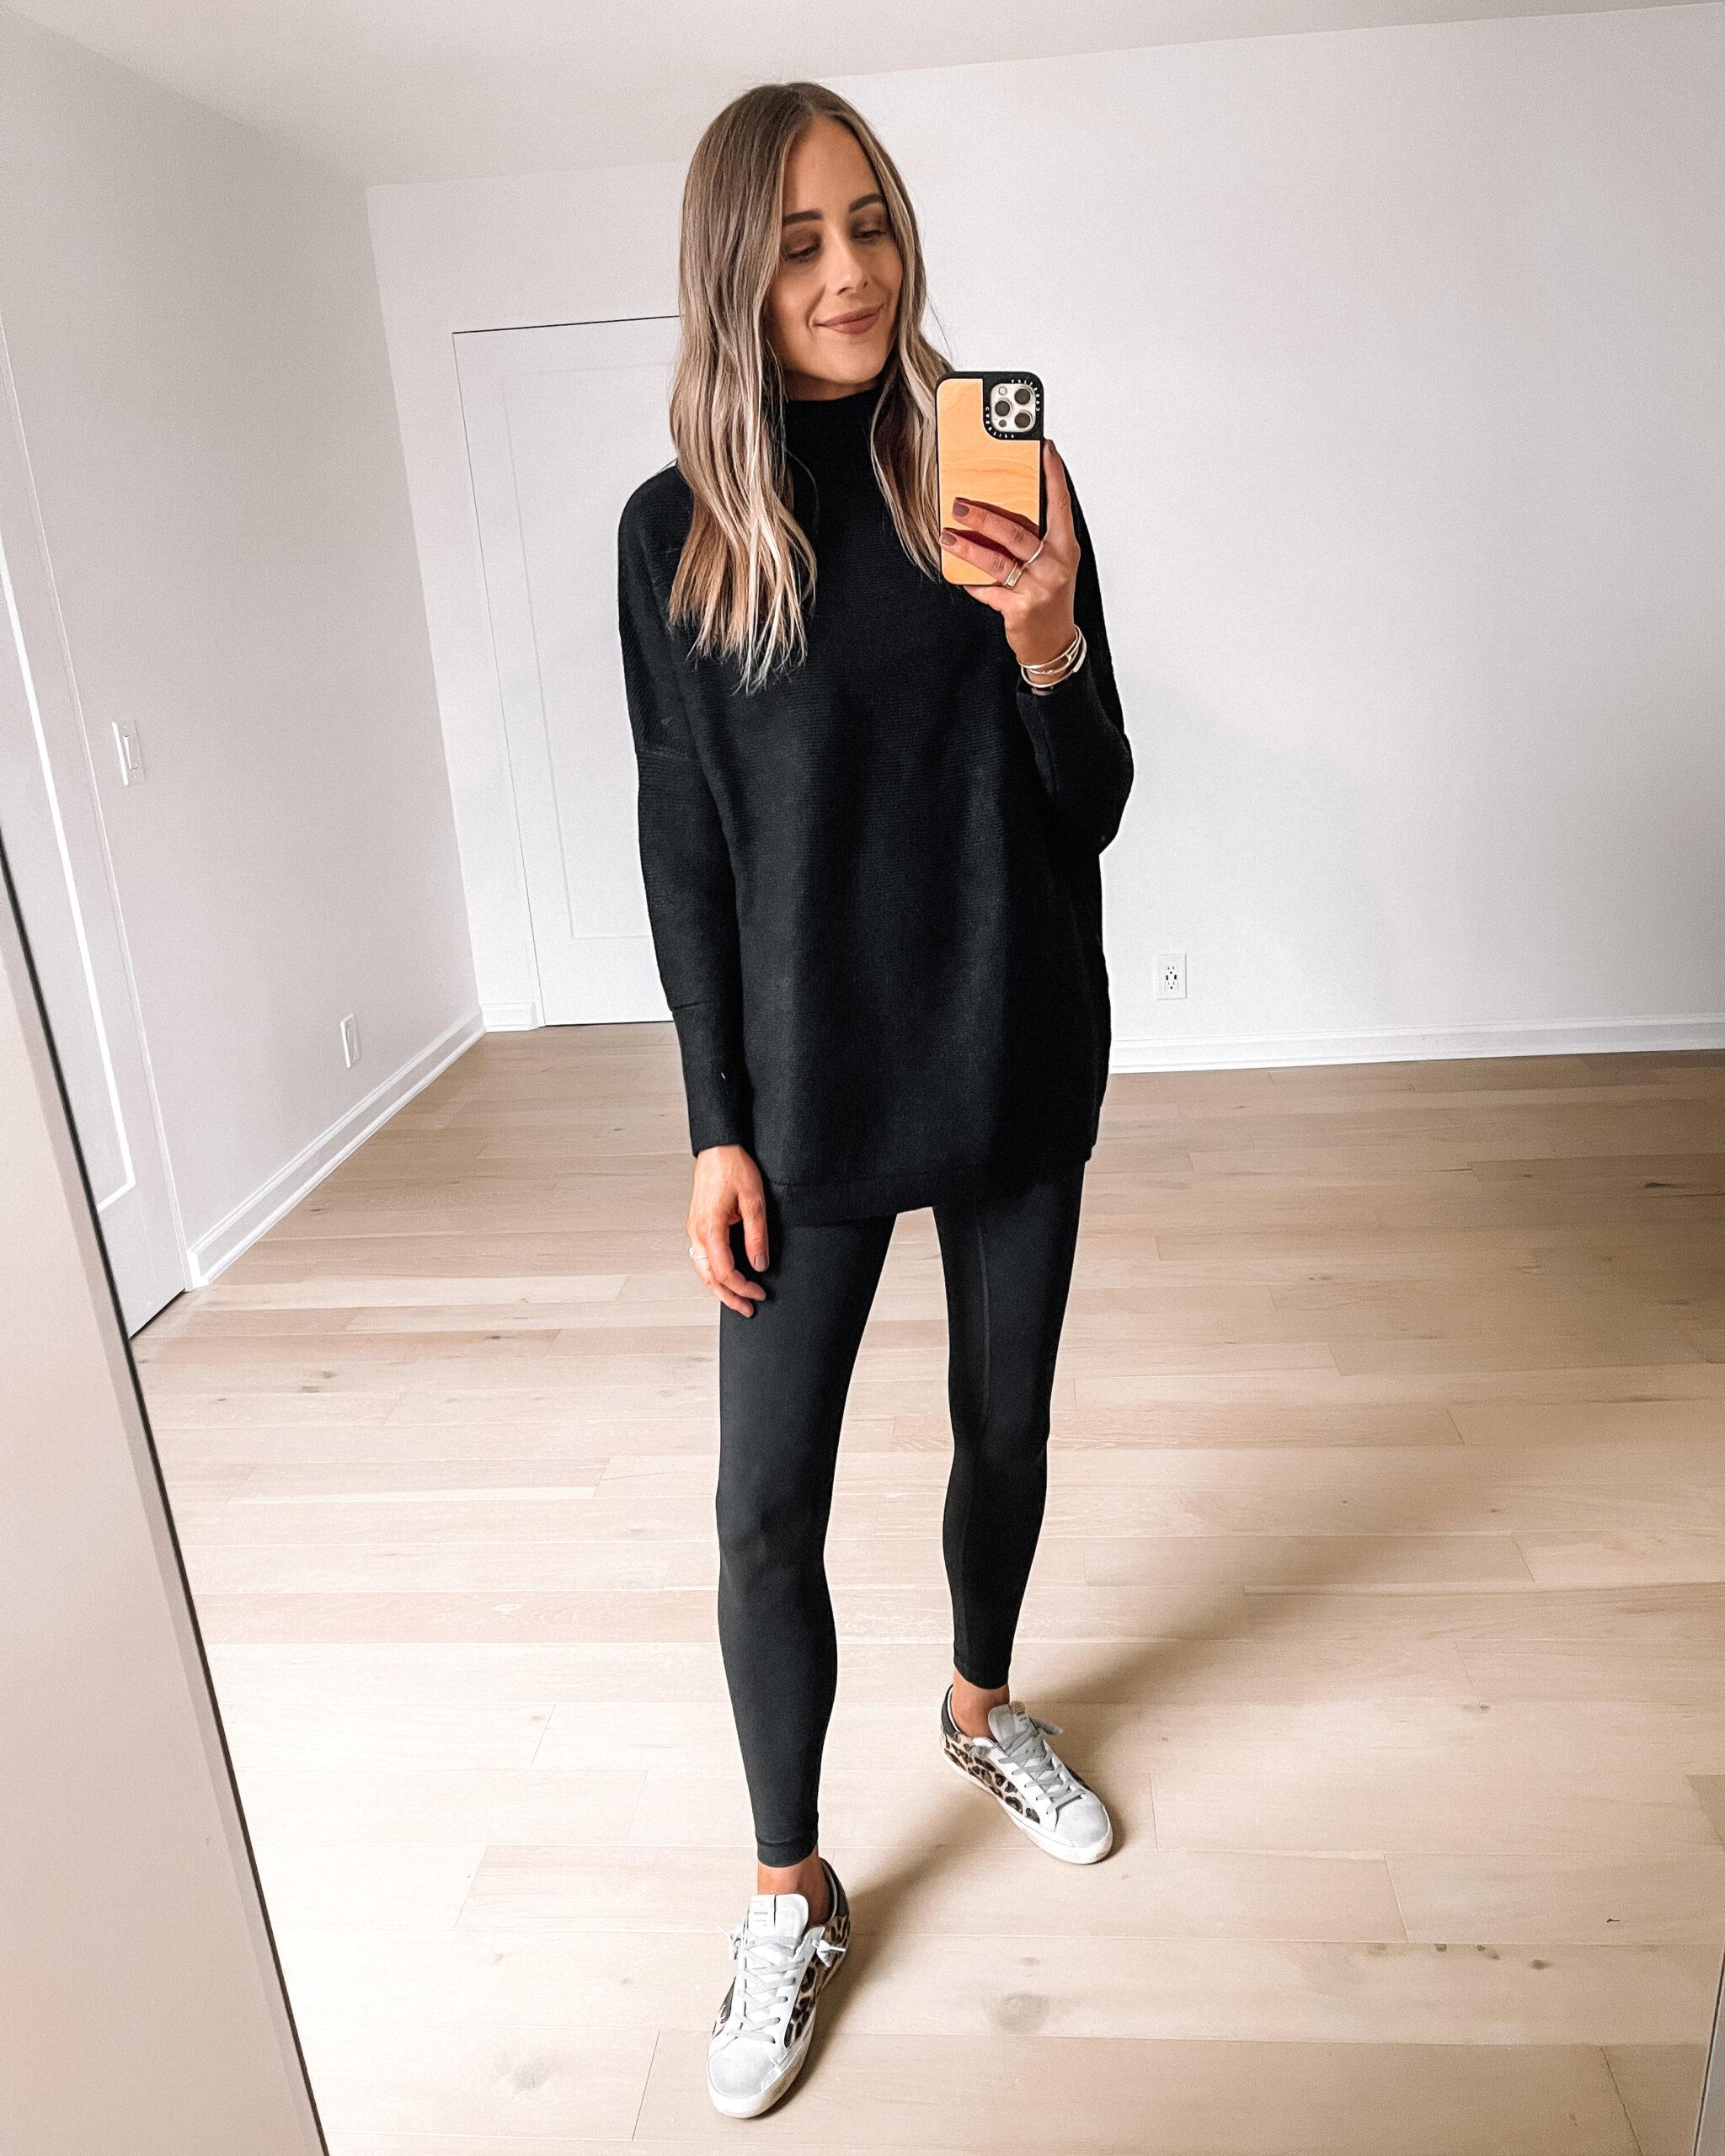 Fashion Jackson Wearing Amazon Fashion Black Ottoman Sweater Black Leggings Leopard Golden Goose Sneakers Outfit